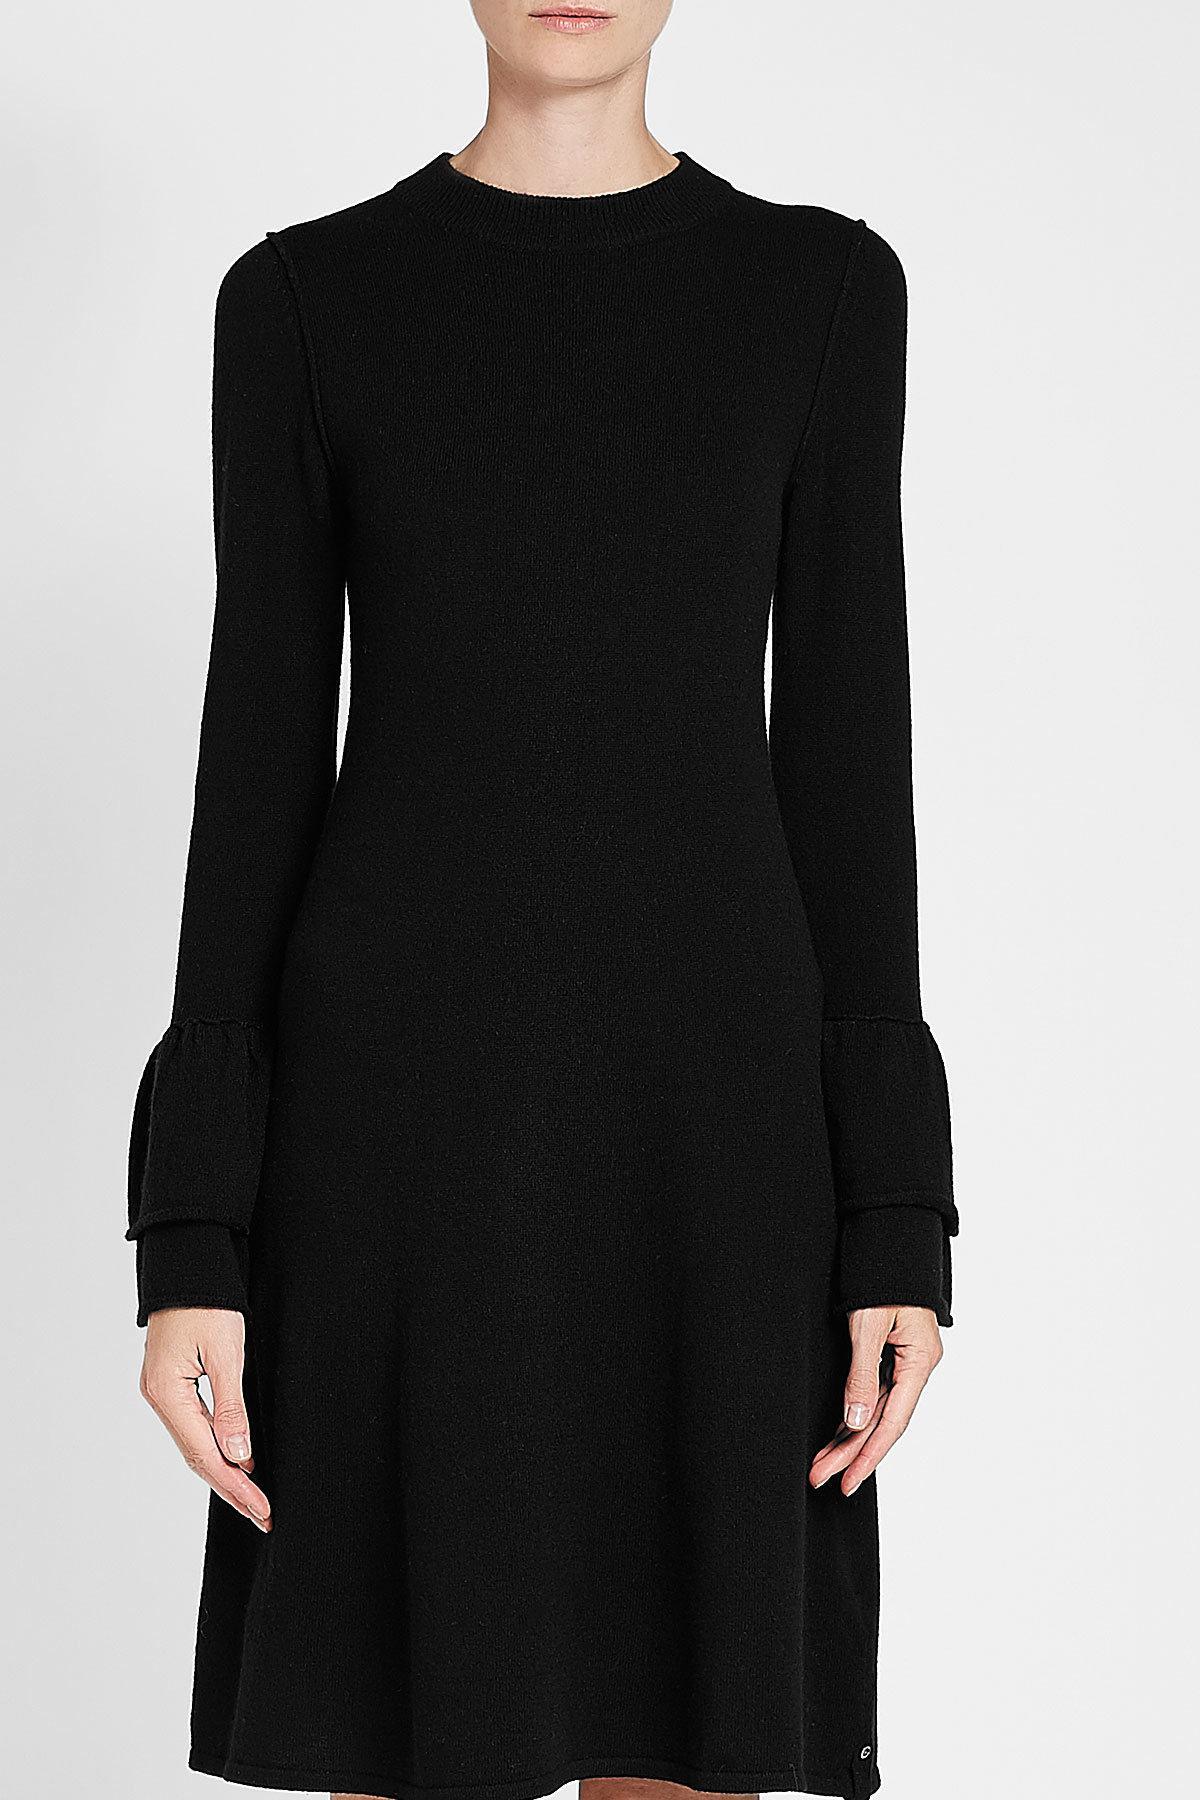 81hours - Black Hada Dress In Wool And Cashmere - Lyst. View fullscreen de6efbf6e